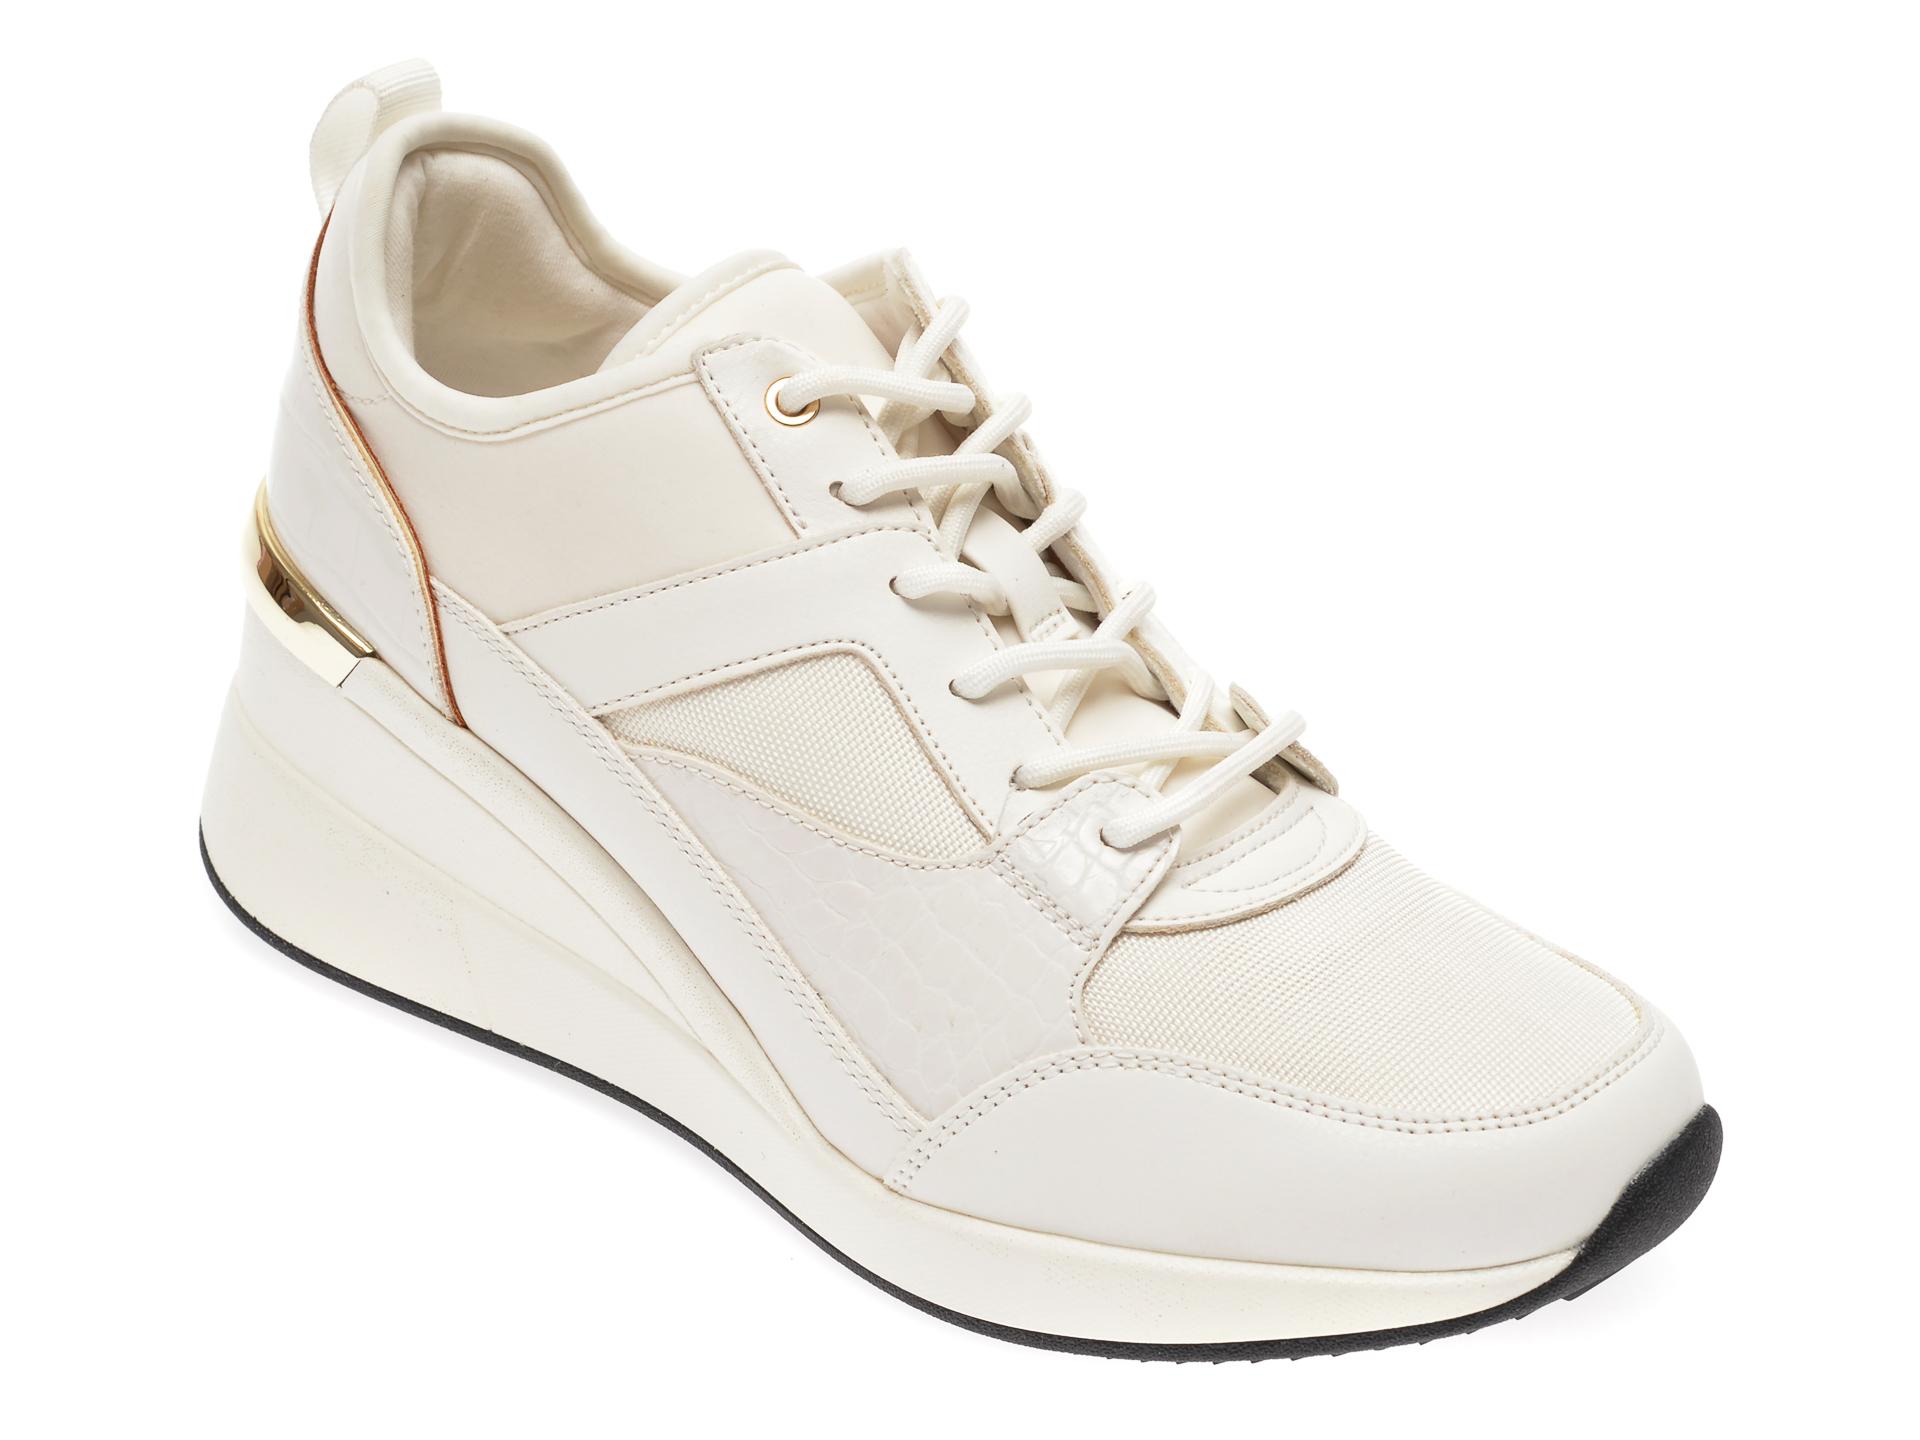 Pantofi sport ALDO albi, Thrundra100, din material textil si piele ecologica imagine